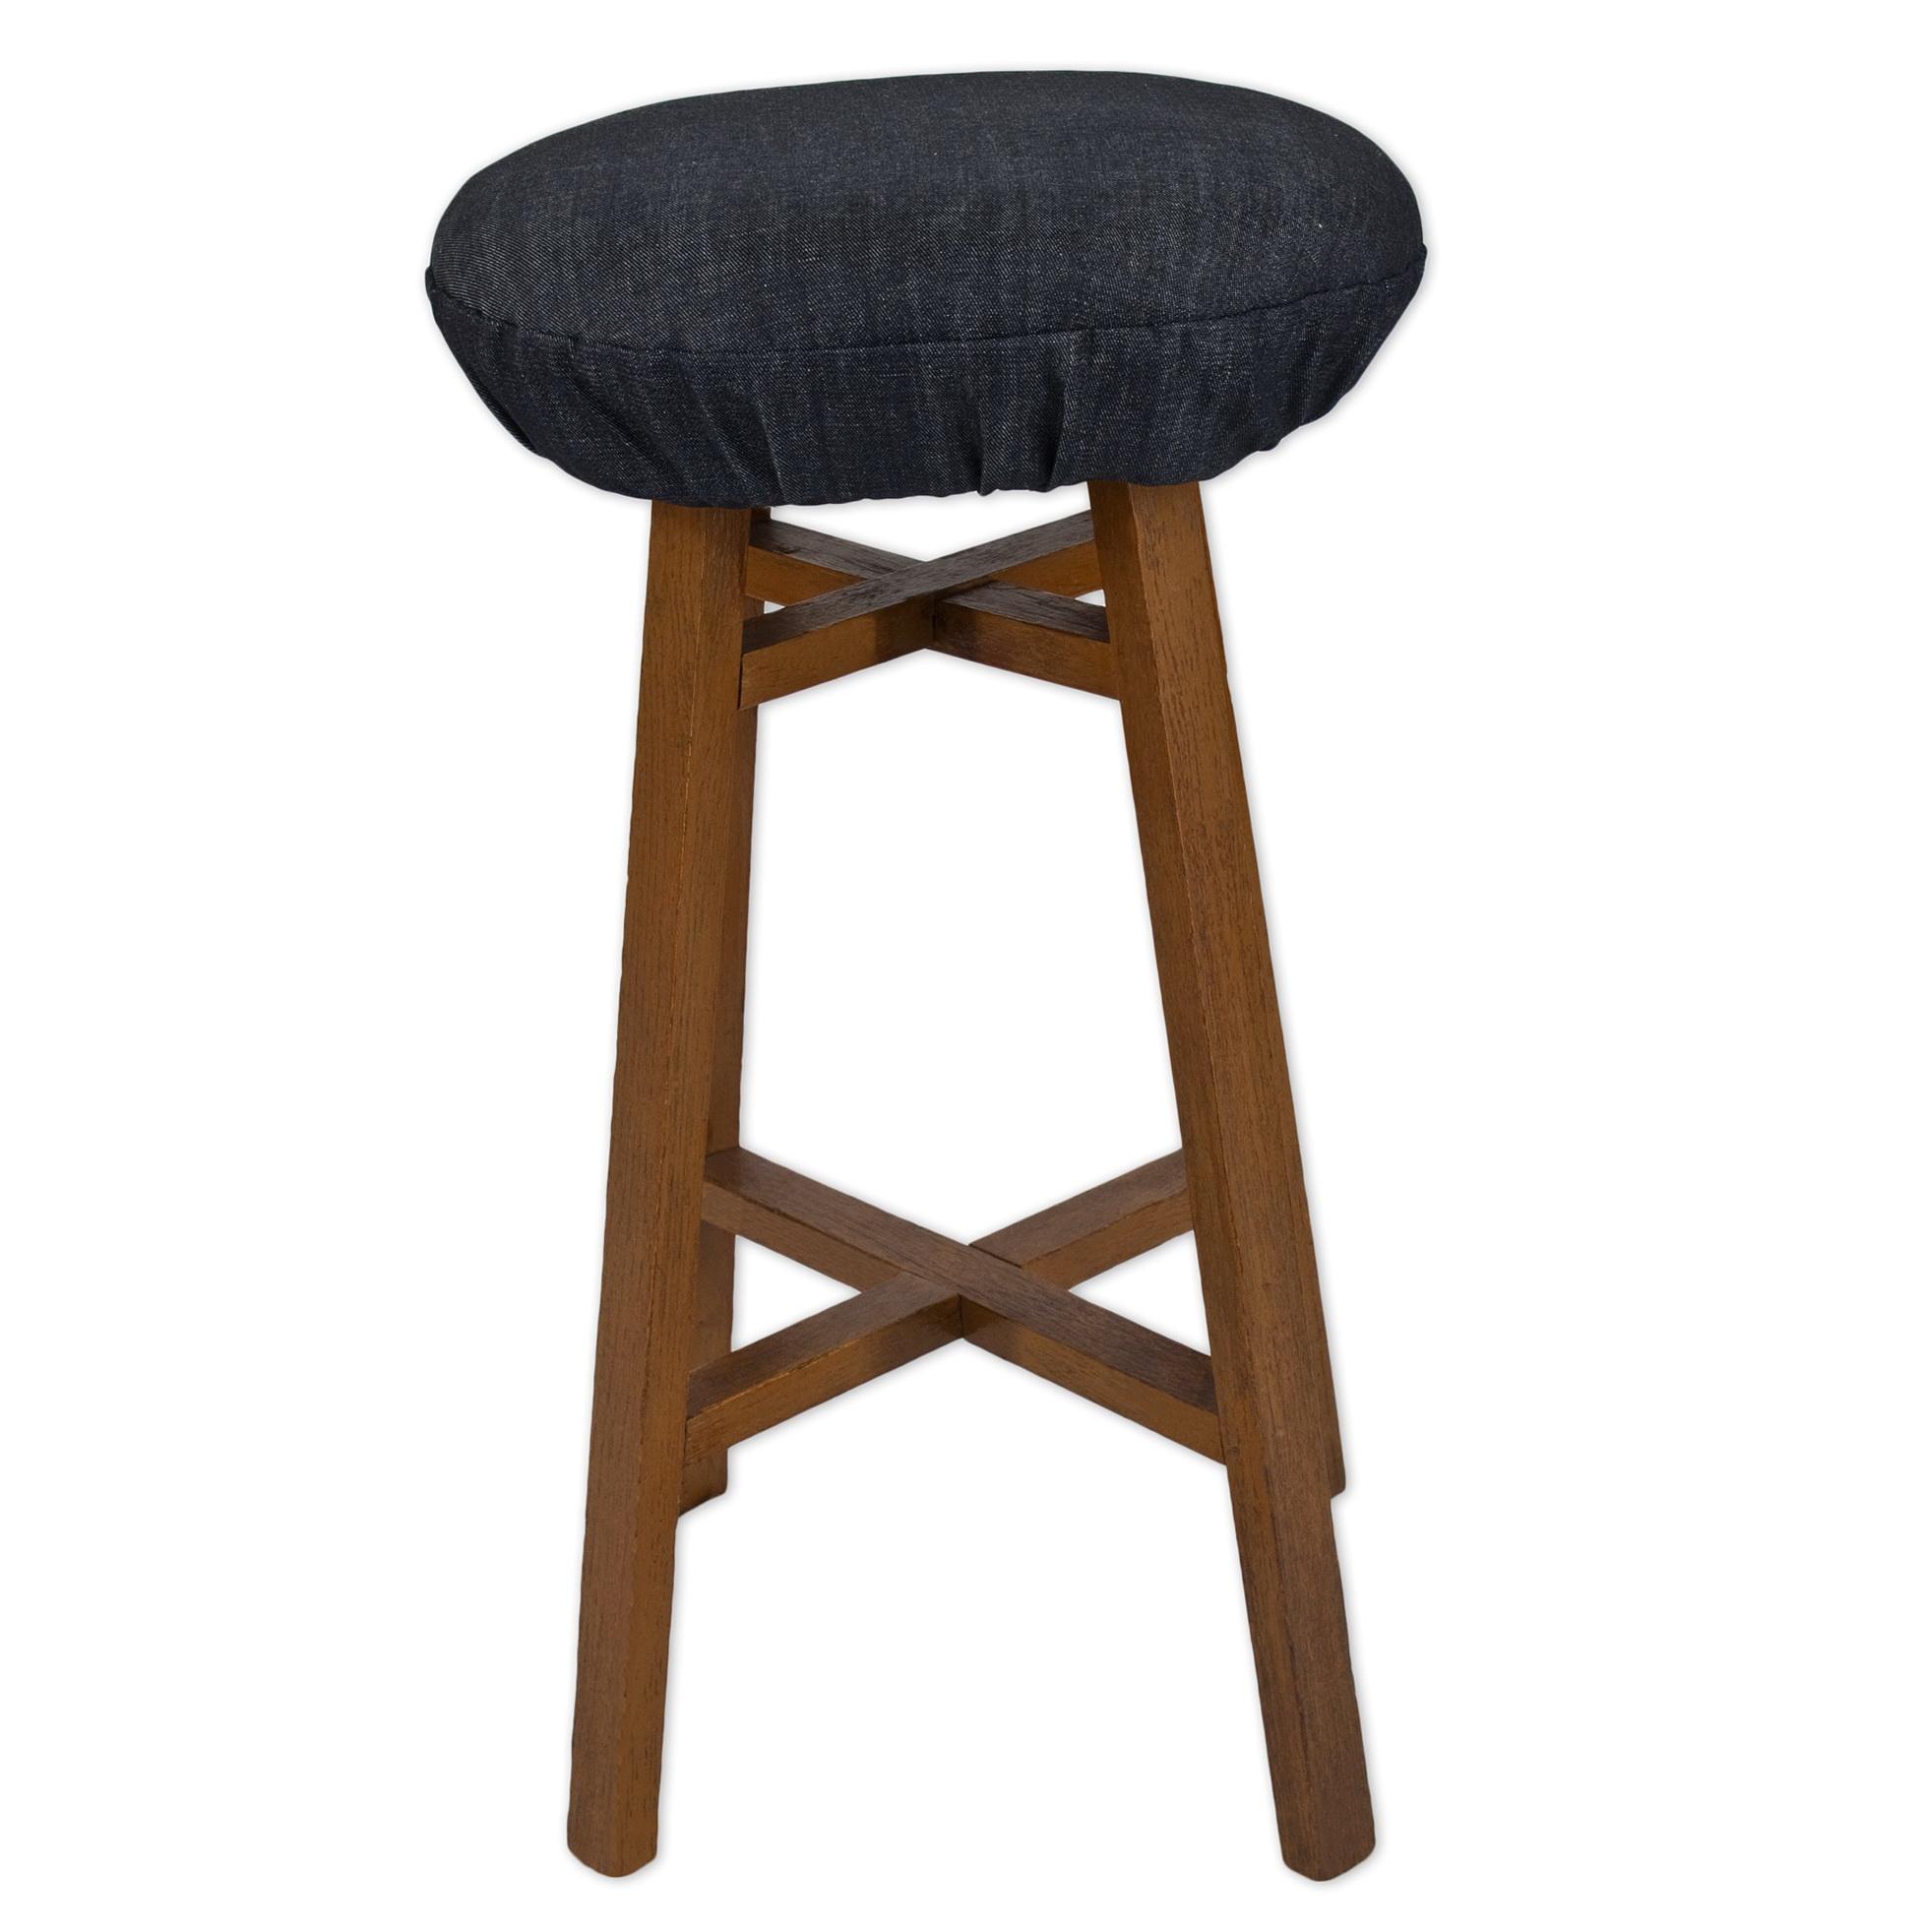 Bar Stool Cushion Covers Home Design Ideas : bar stool cushion covers from www.zintaaistars.com size 1952 x 1963 jpeg 415kB